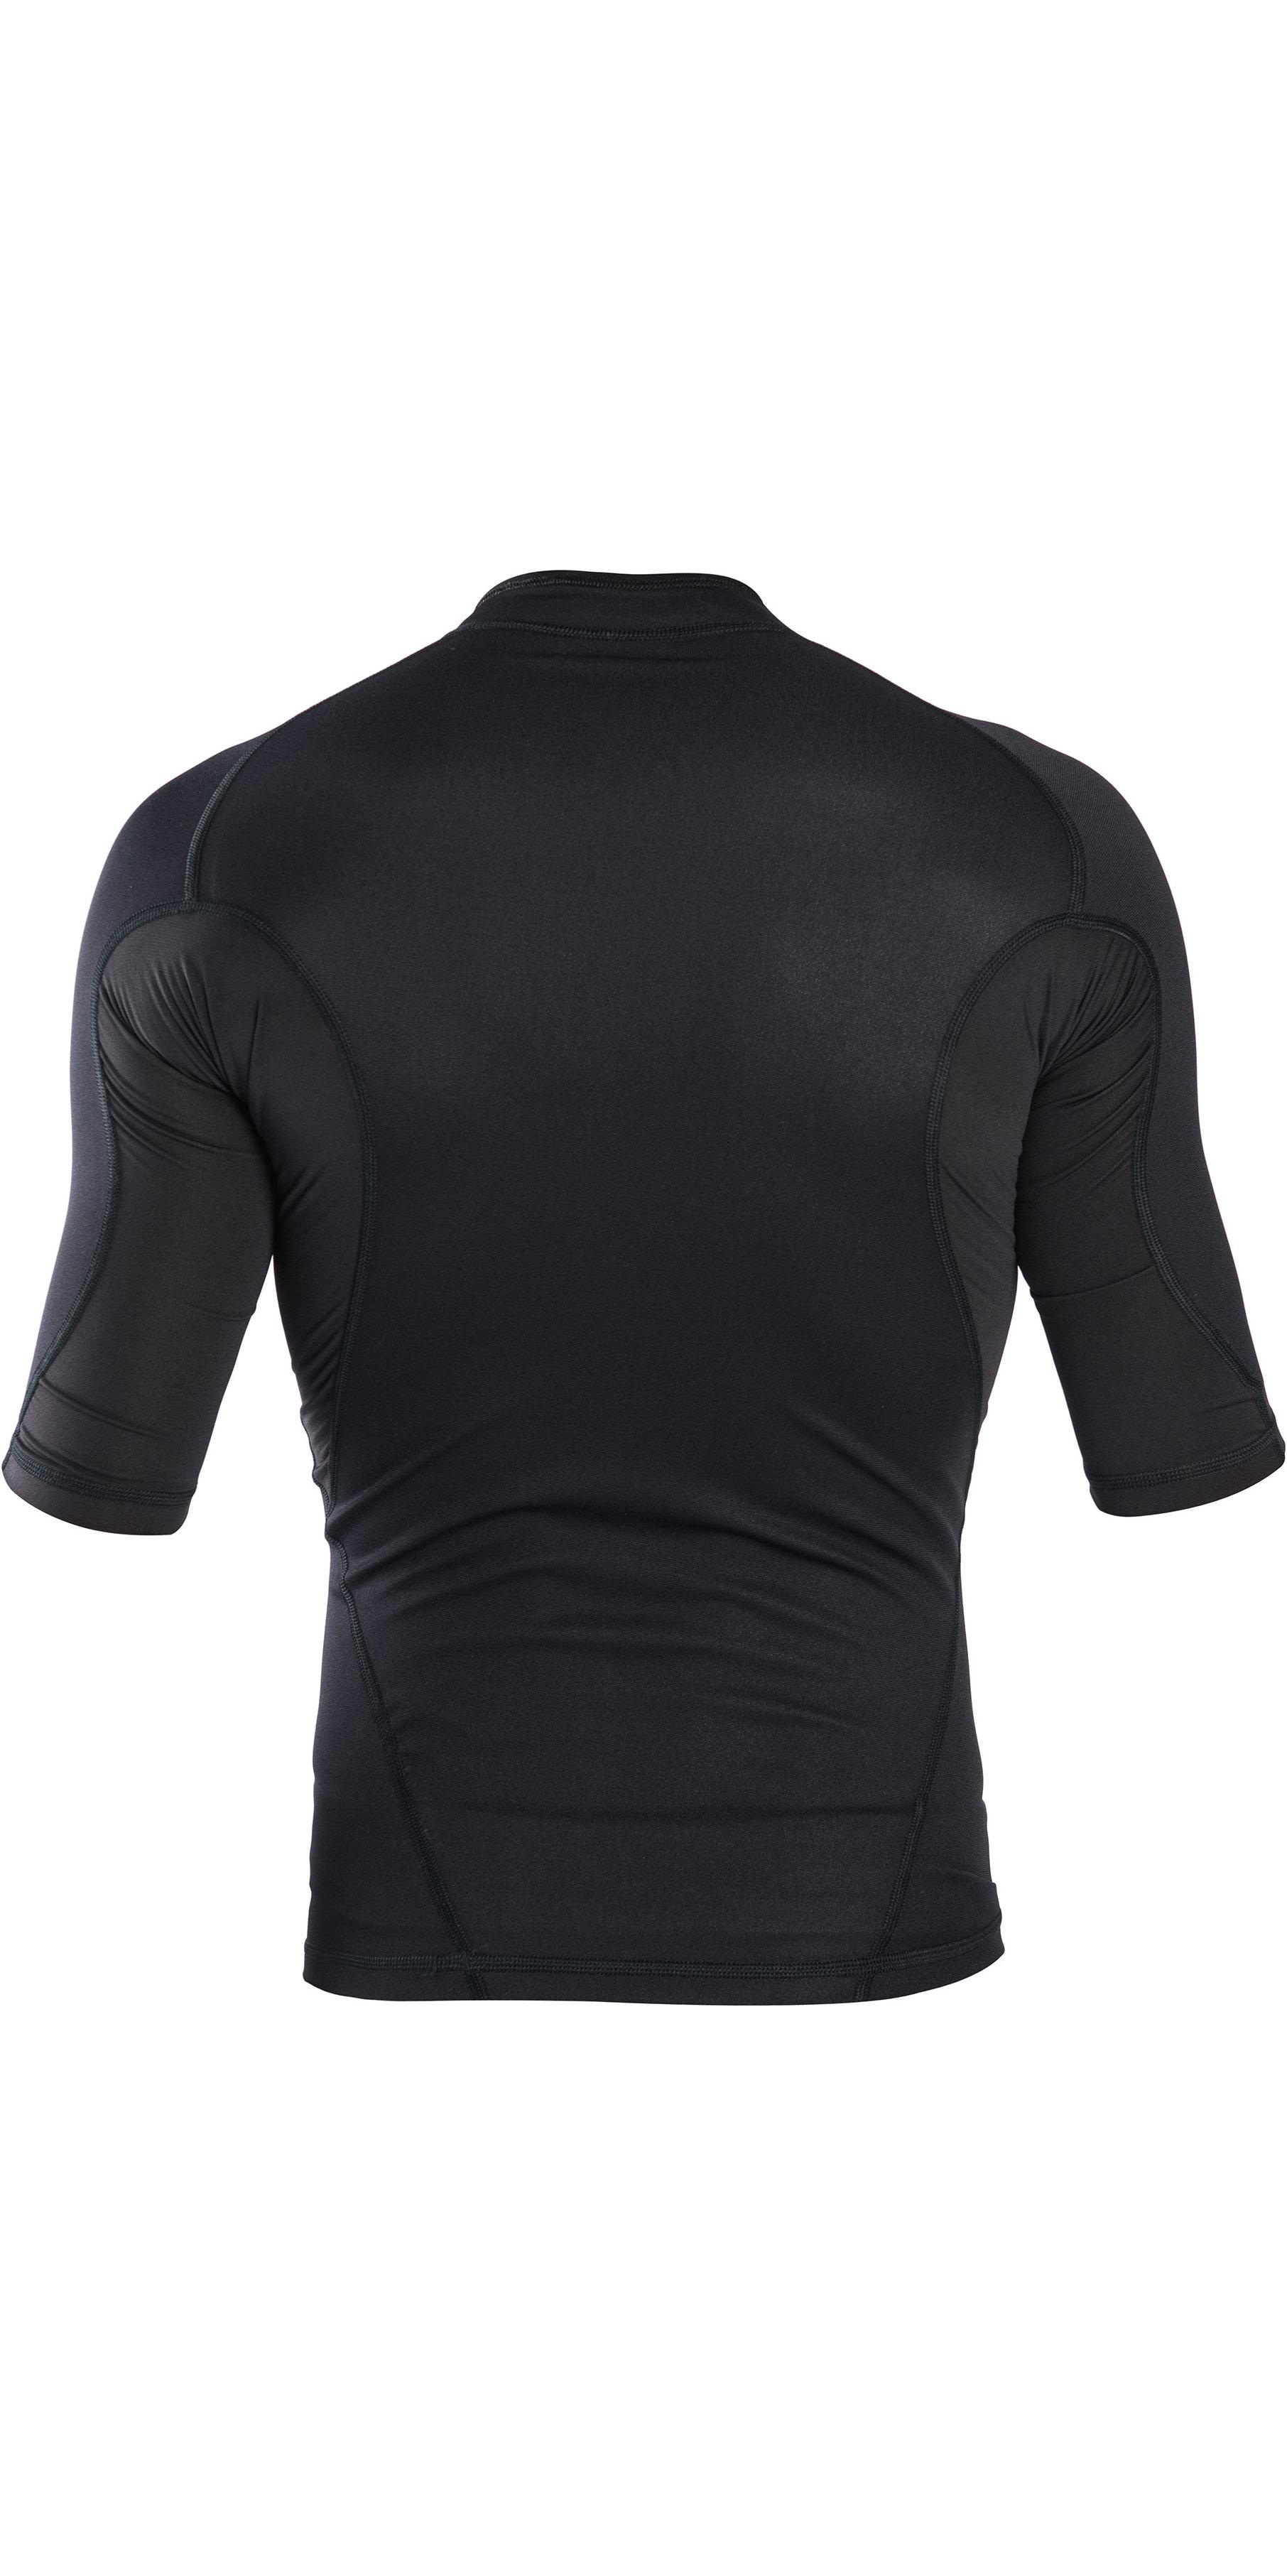 2019 Rip Curl Mens Hotskin 0.5mm Short Sleeve Neoprene Jacket Black WVE8HM